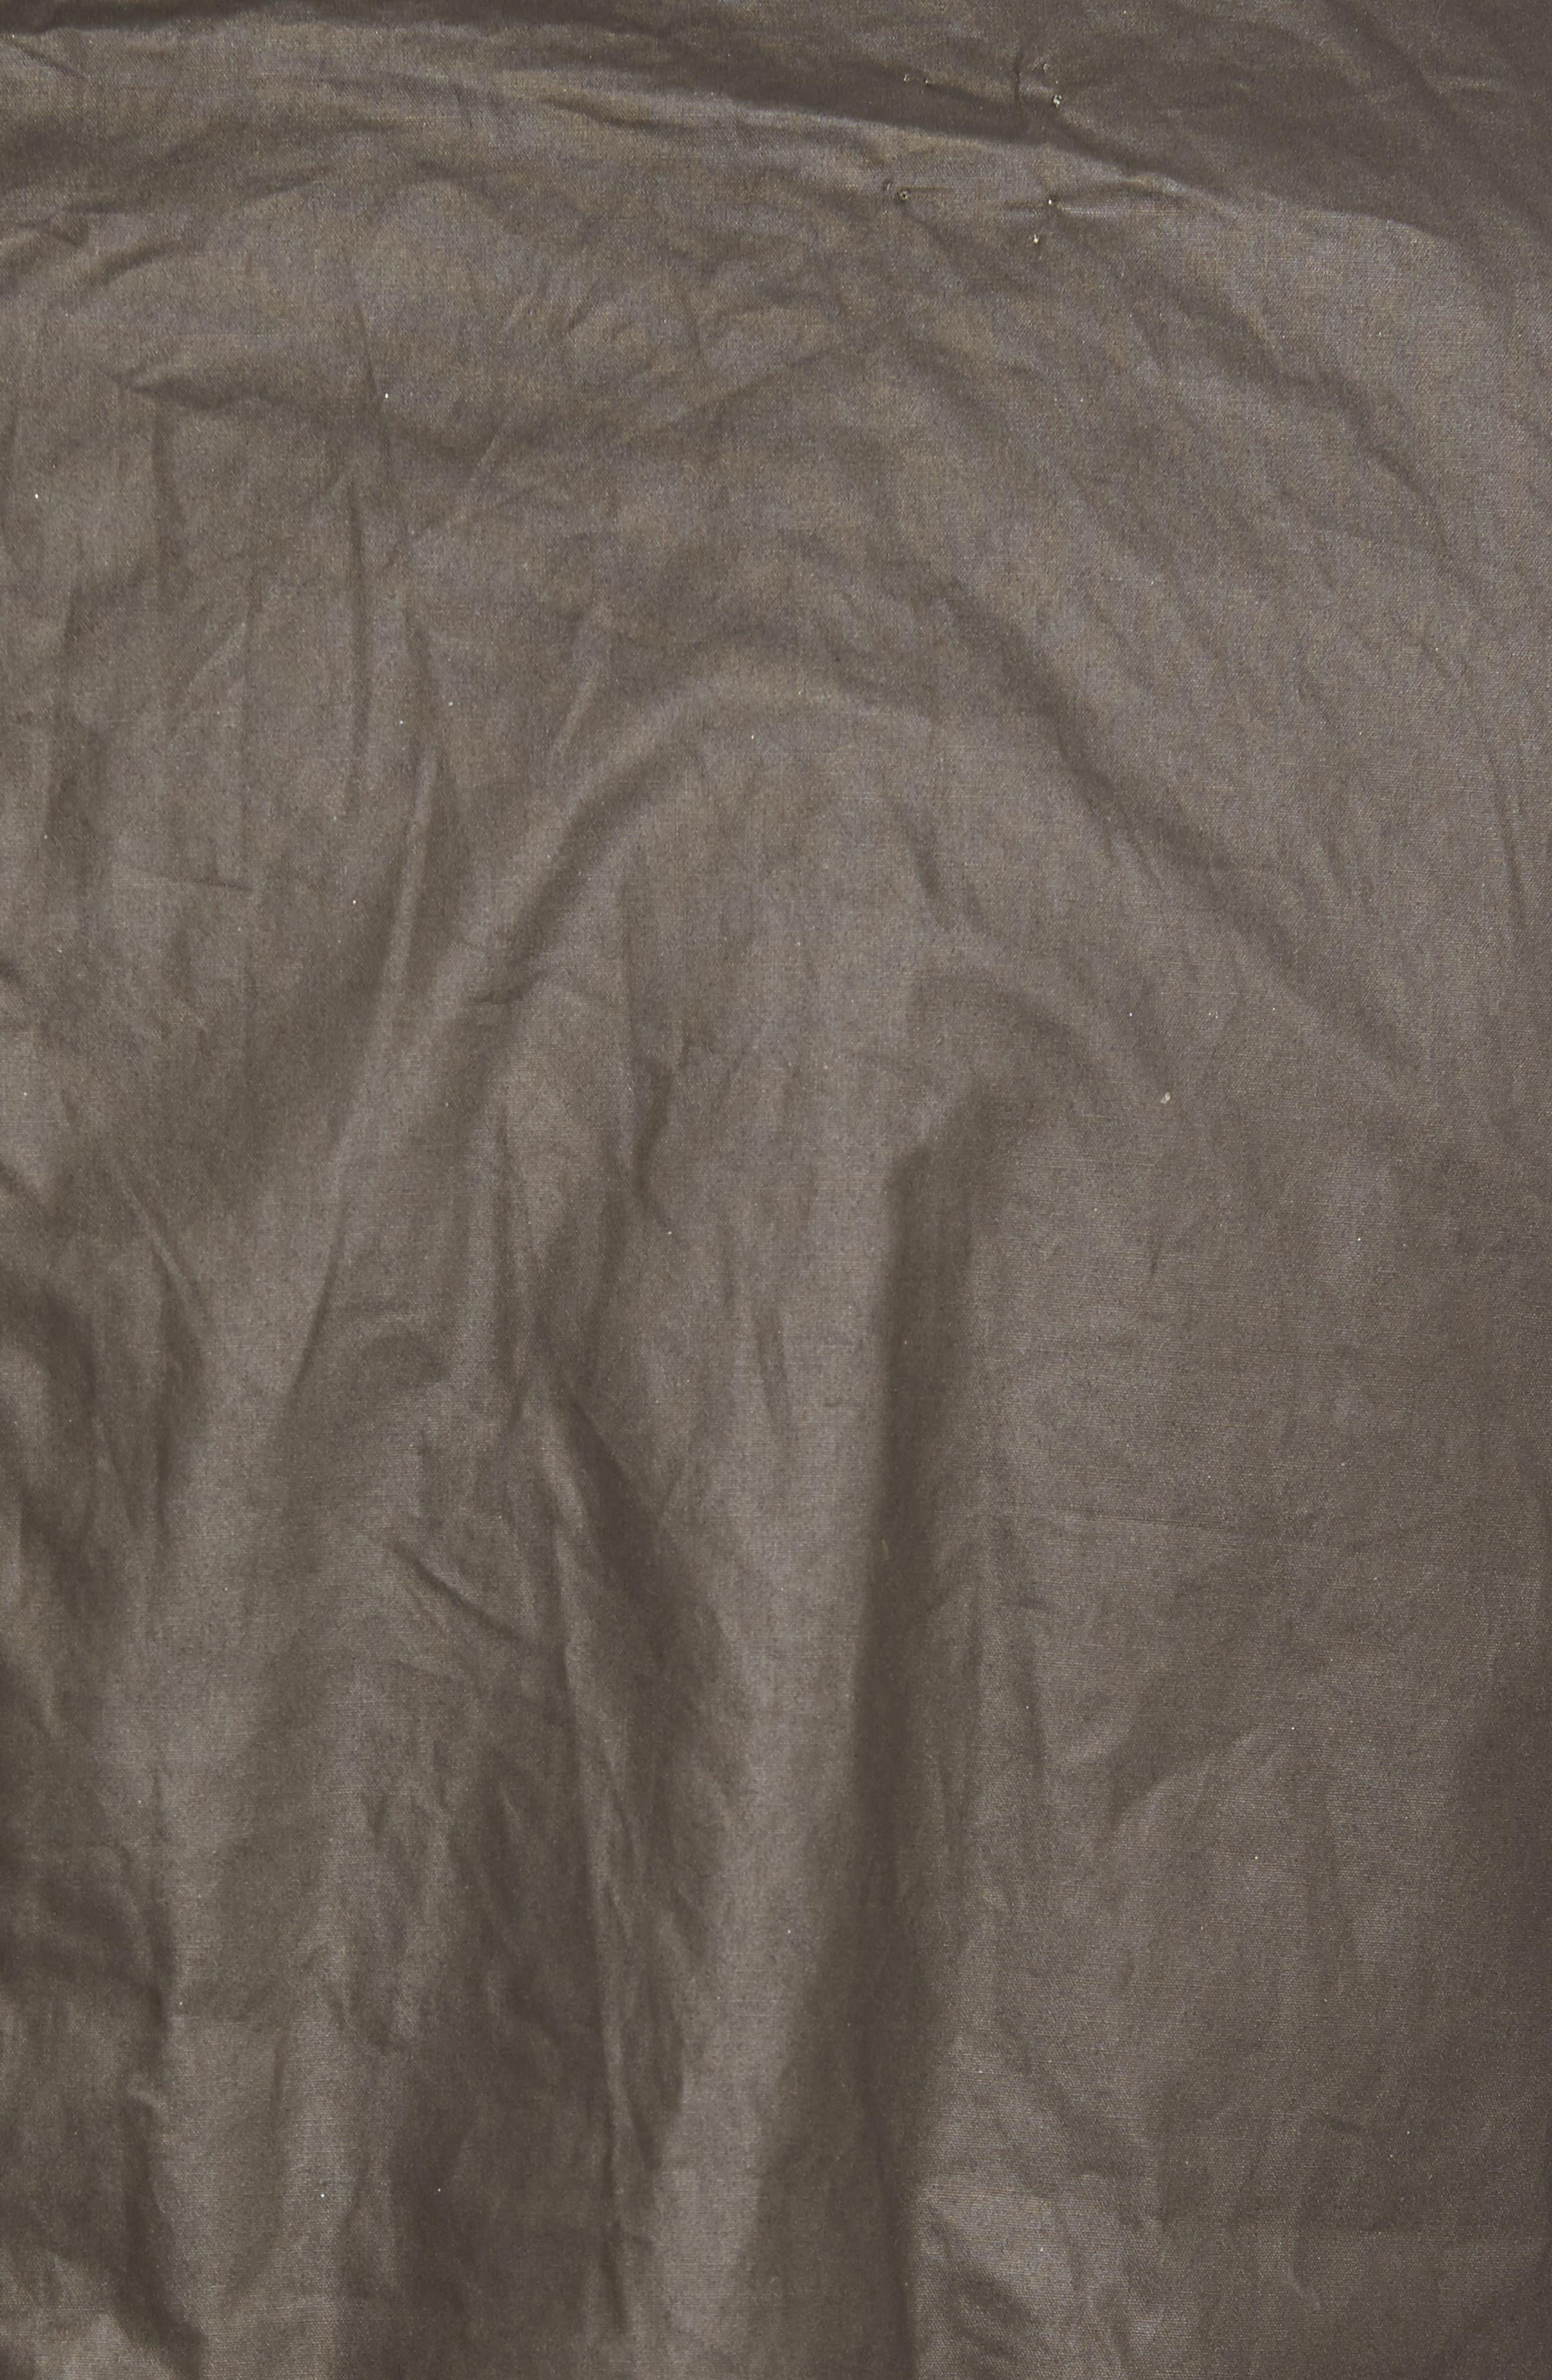 Water-Resistant Genuine Rabbit Fur Lined Vest,                             Alternate thumbnail 6, color,